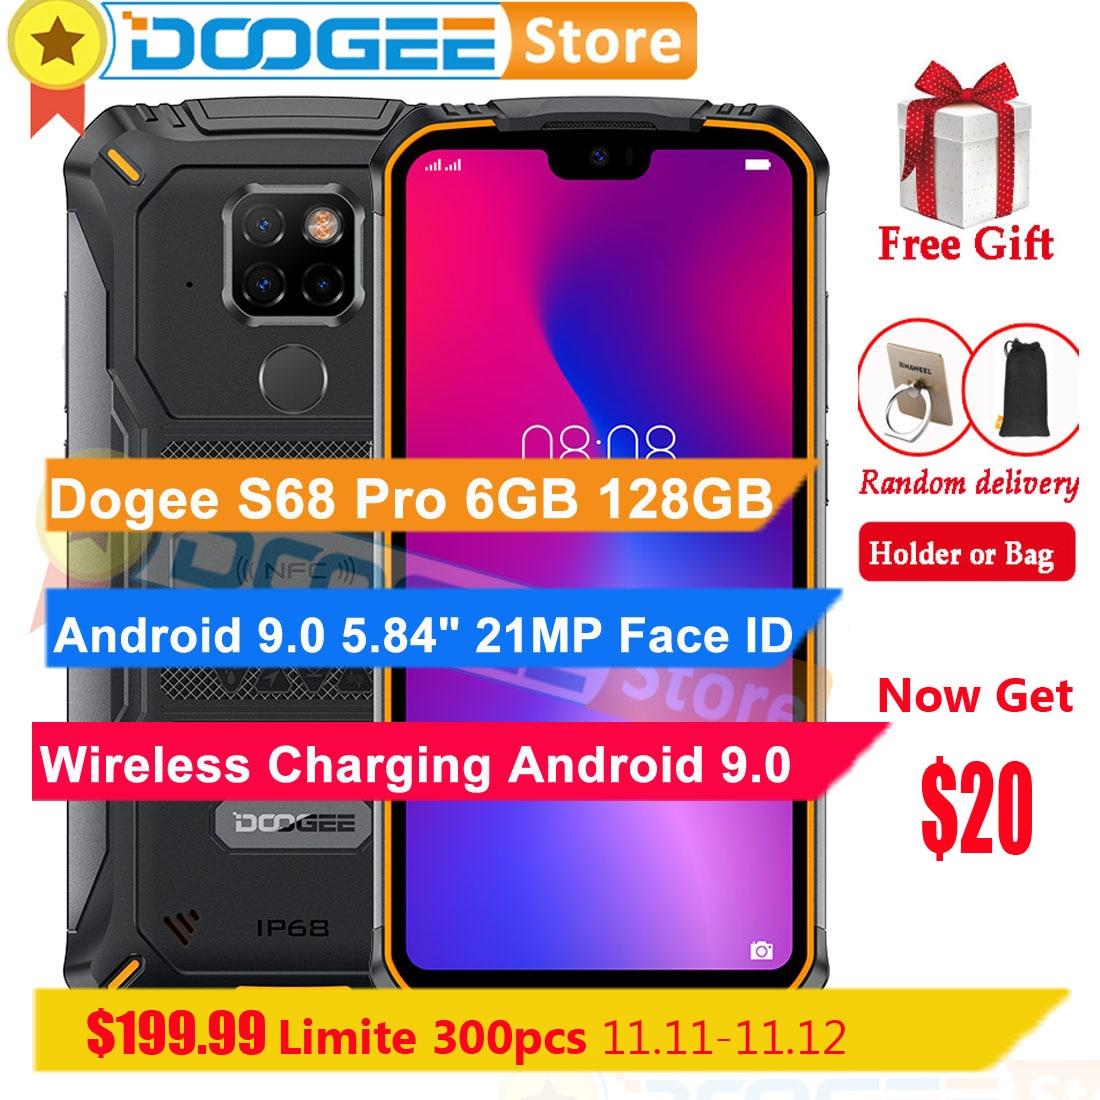 "Doogee s68 pro 6 gb 128 gb telefone celular android 9.0 5.84 ""octa núcleo 6300 mah 21mp câmera impressão digital id sem fio carga 4g smartphone"